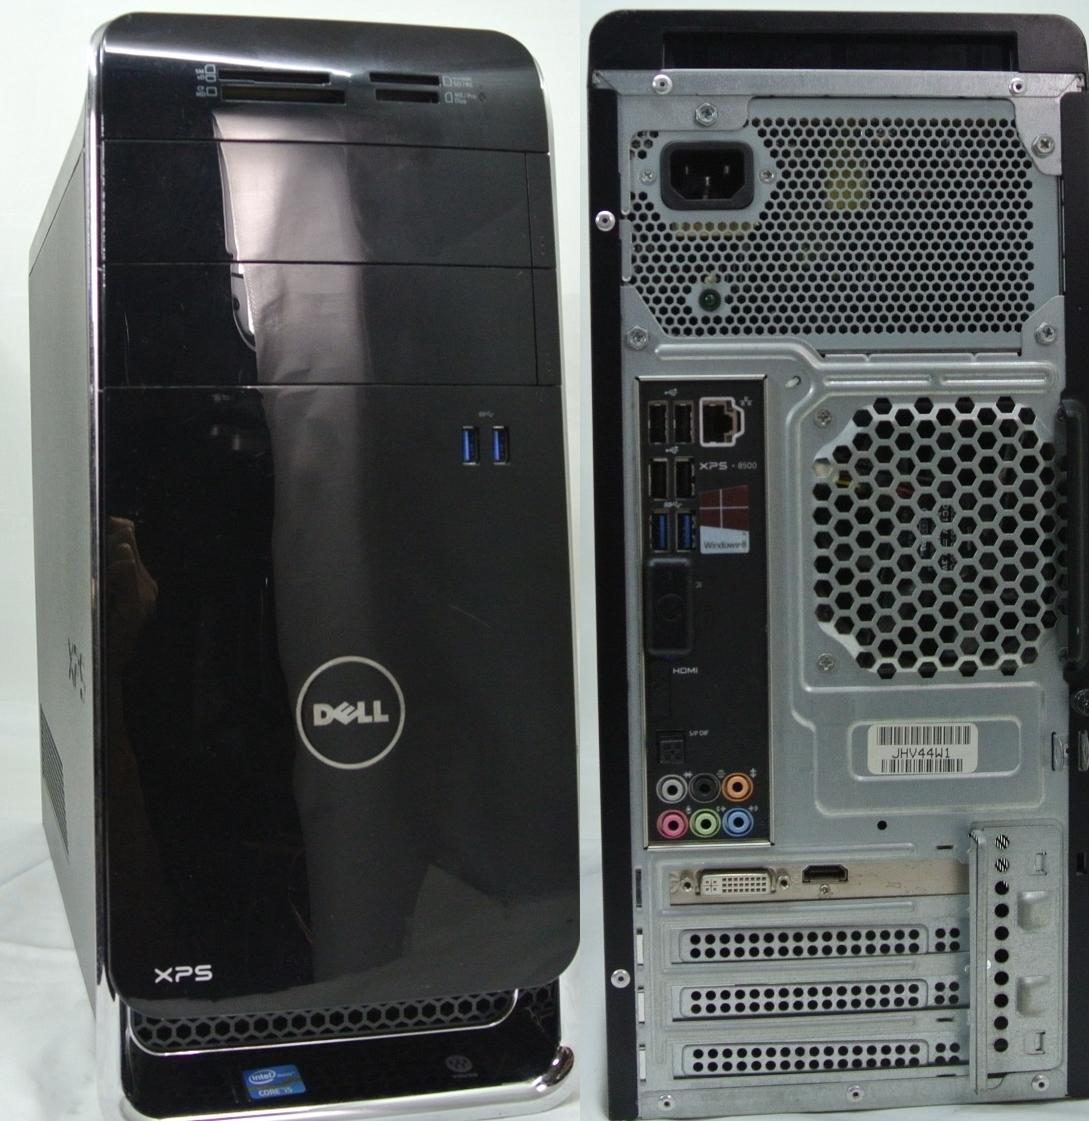 SSD快適PC DELL XPS 8500/i5-3350/12G/新SSD240G+1TB/グラボ/無線/USB3.0/Win10/office2016☆快適PCゲーム/事務作業・即使用可_画像4